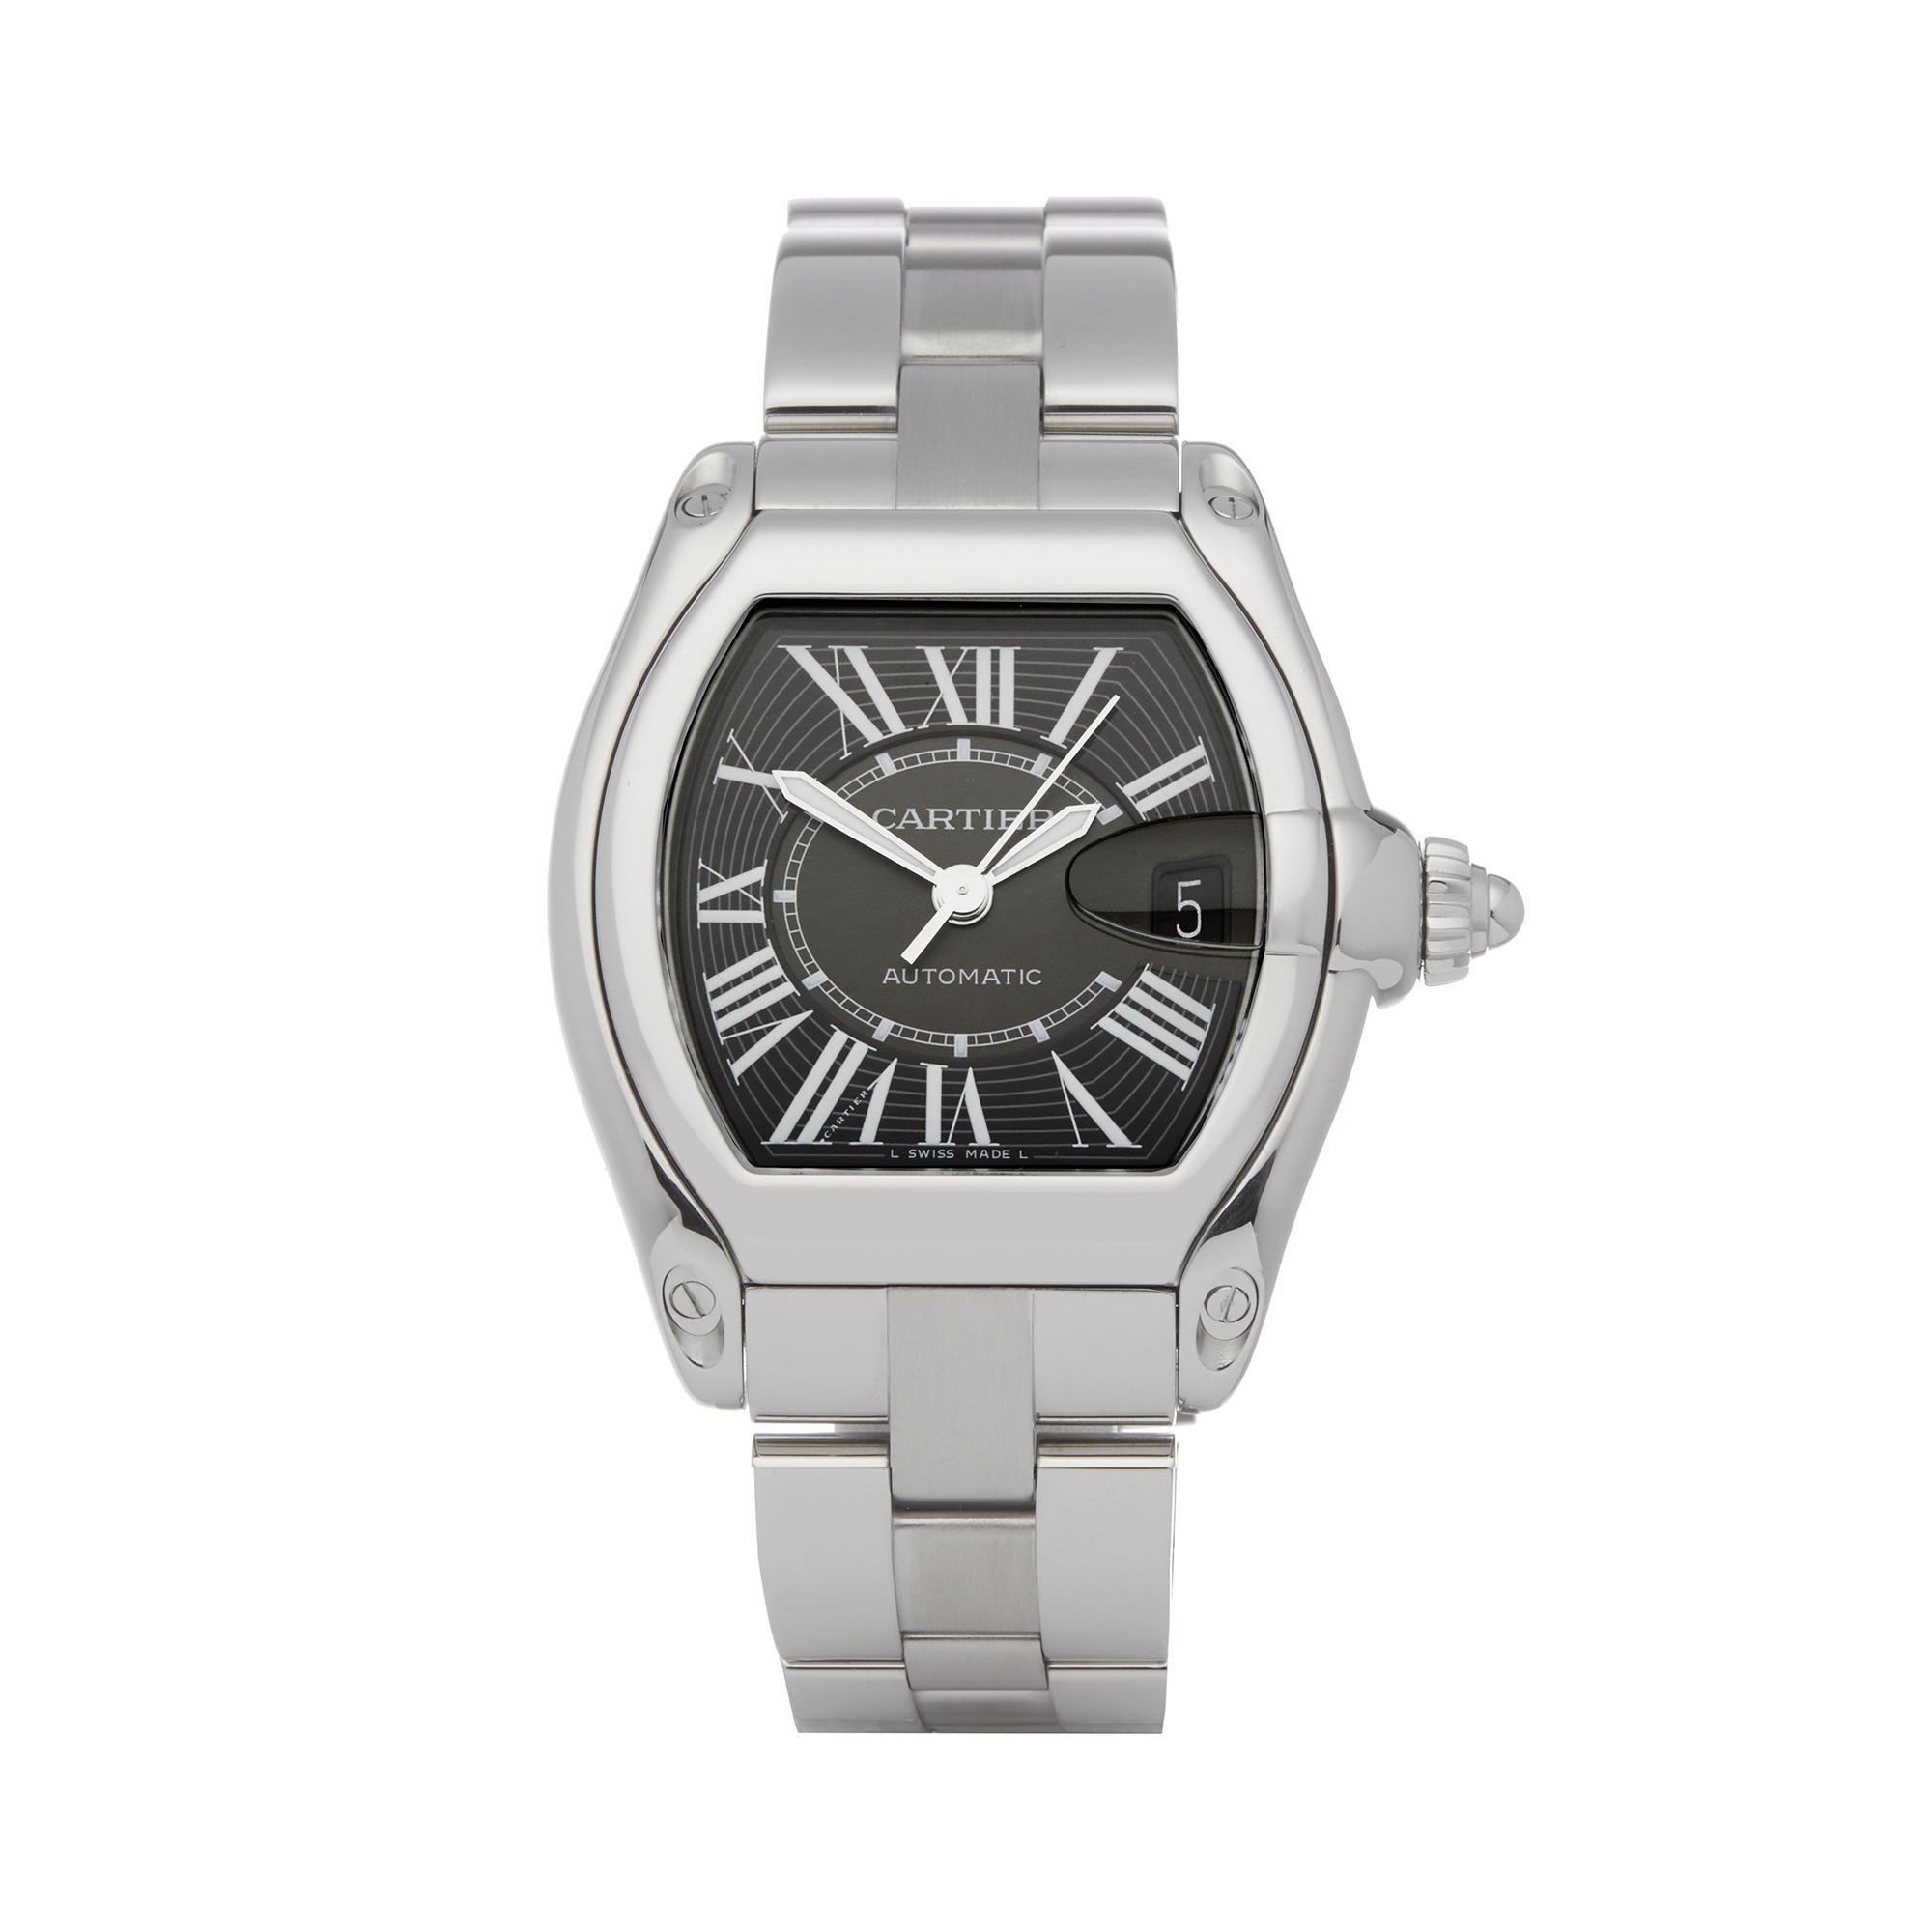 Cartier Roadster 2510 Men Stainless Steel Watch - Image 8 of 8